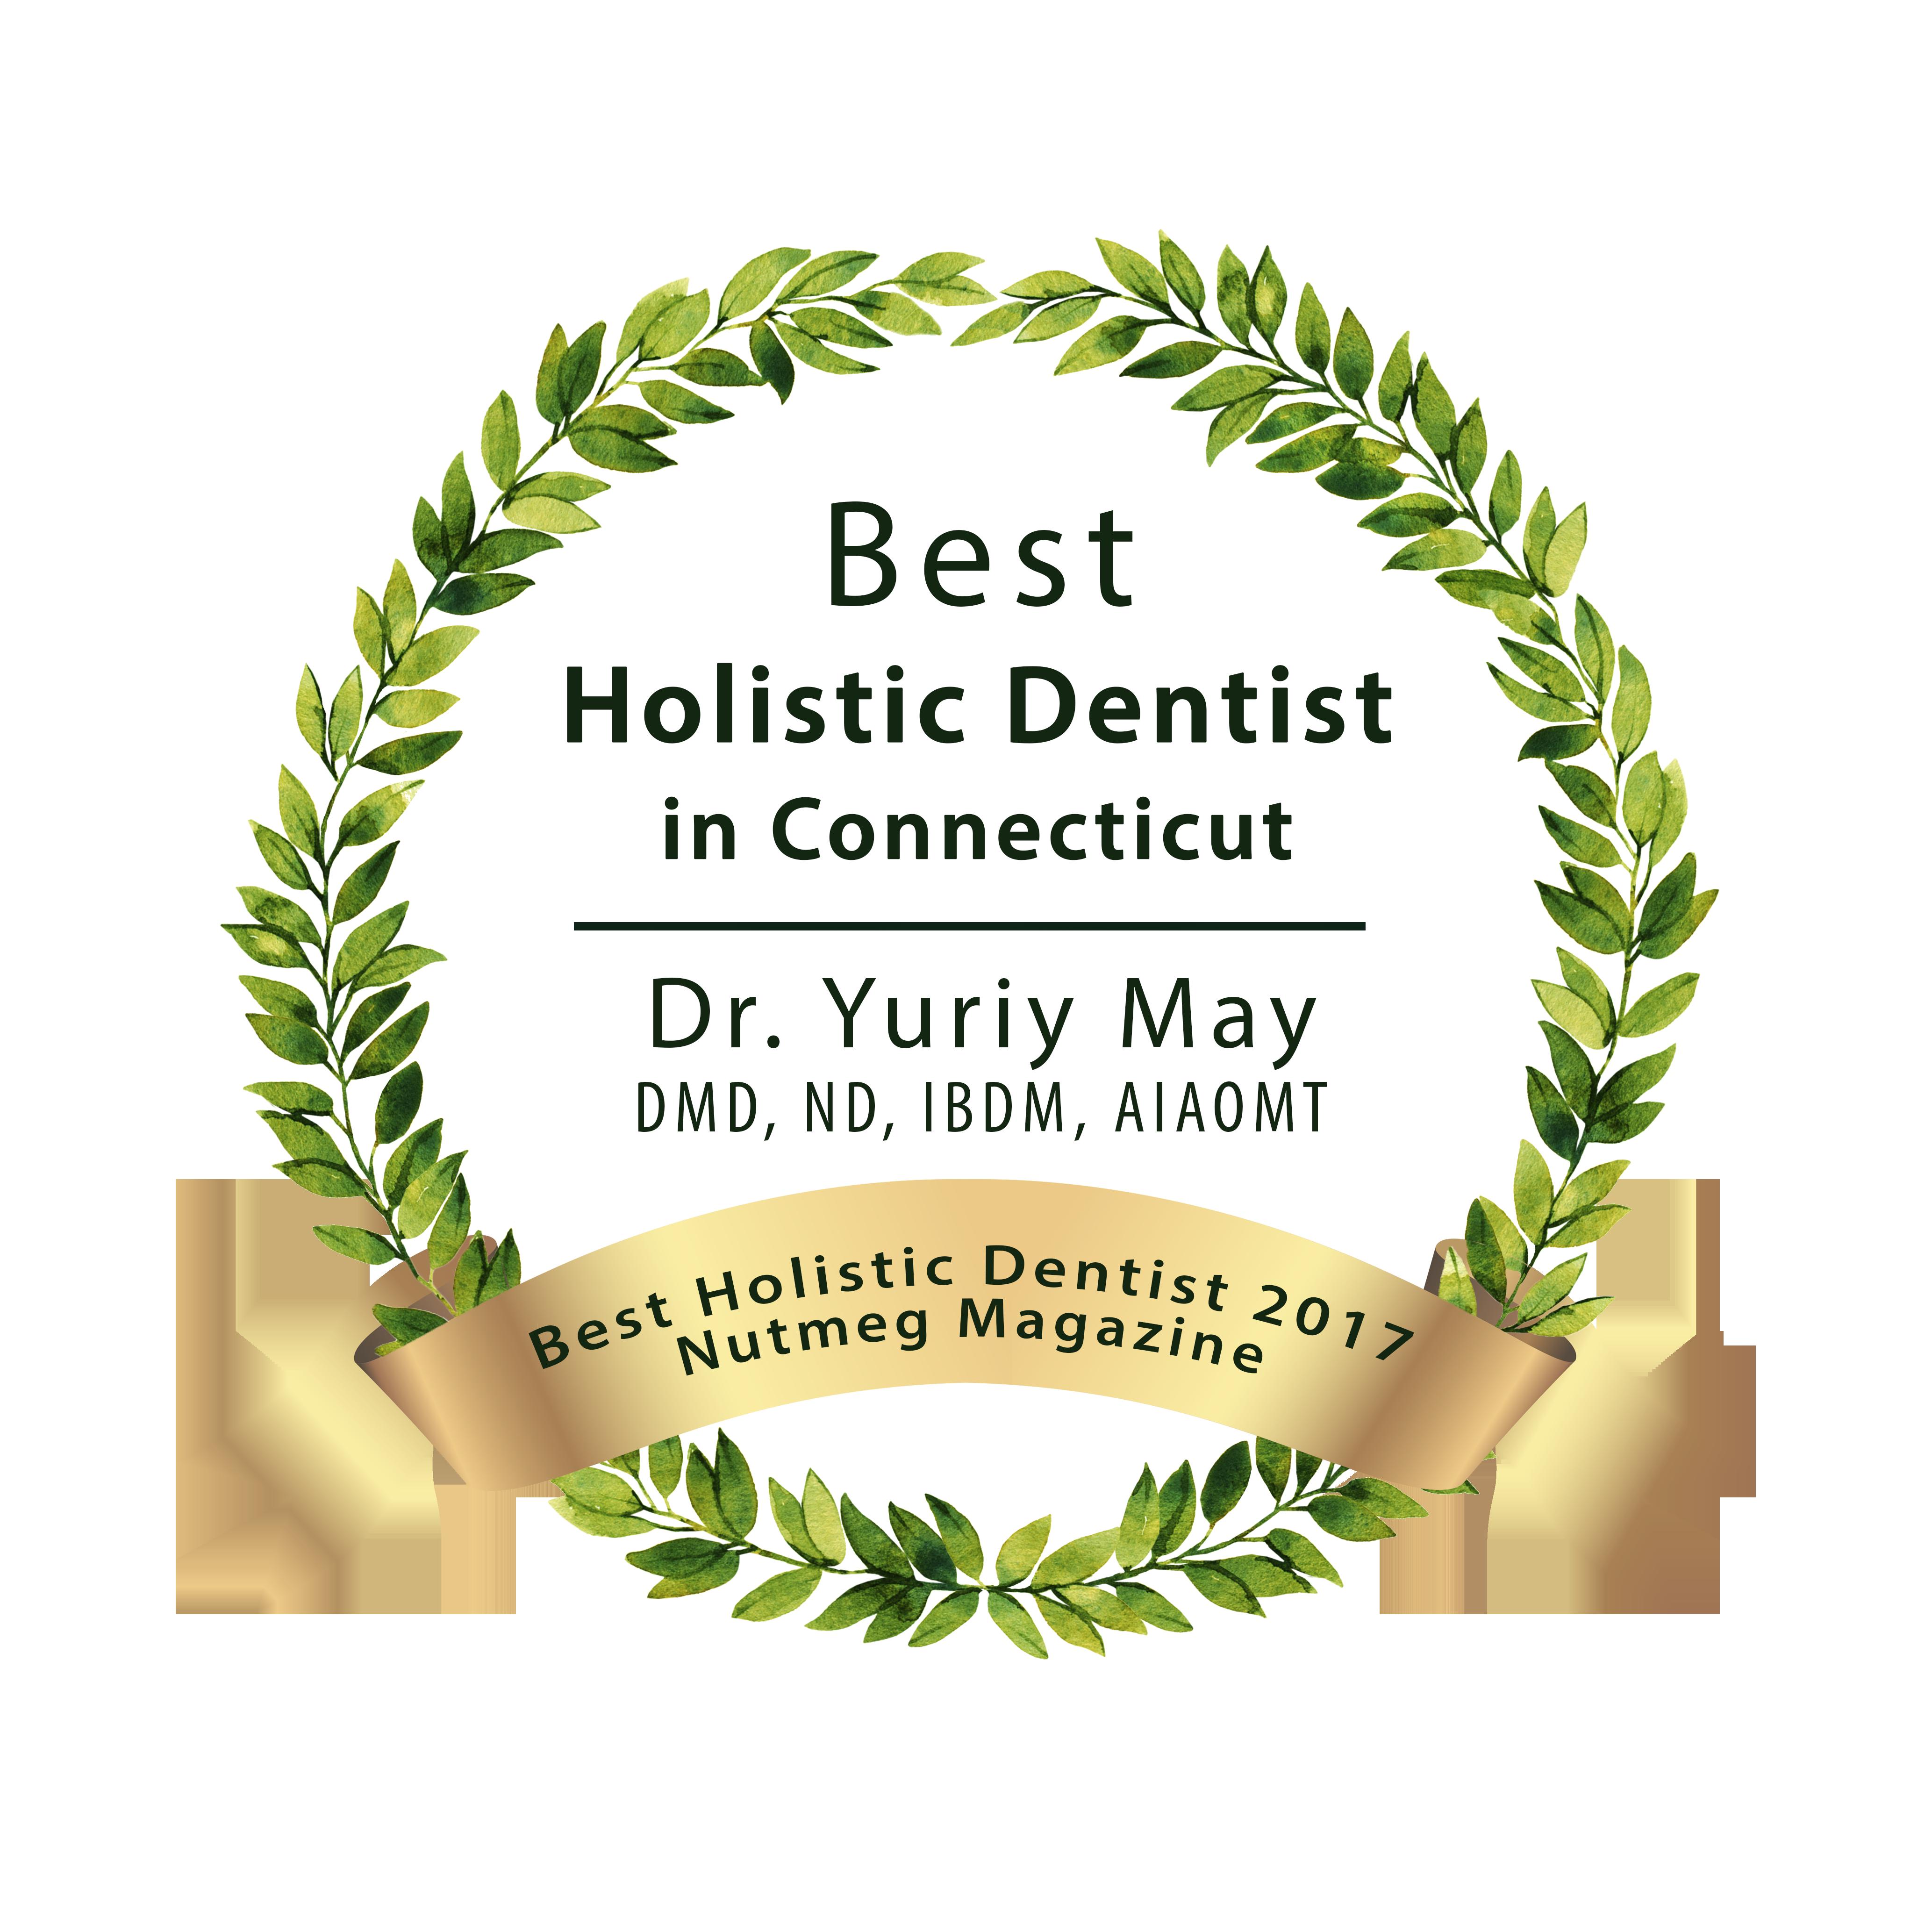 Best Holistic Dentist USA Best Biological Dentist USA Dr. Yuriy May Natural Dentistry Center NY CA CT UT TX FL NC OH MA VT RI